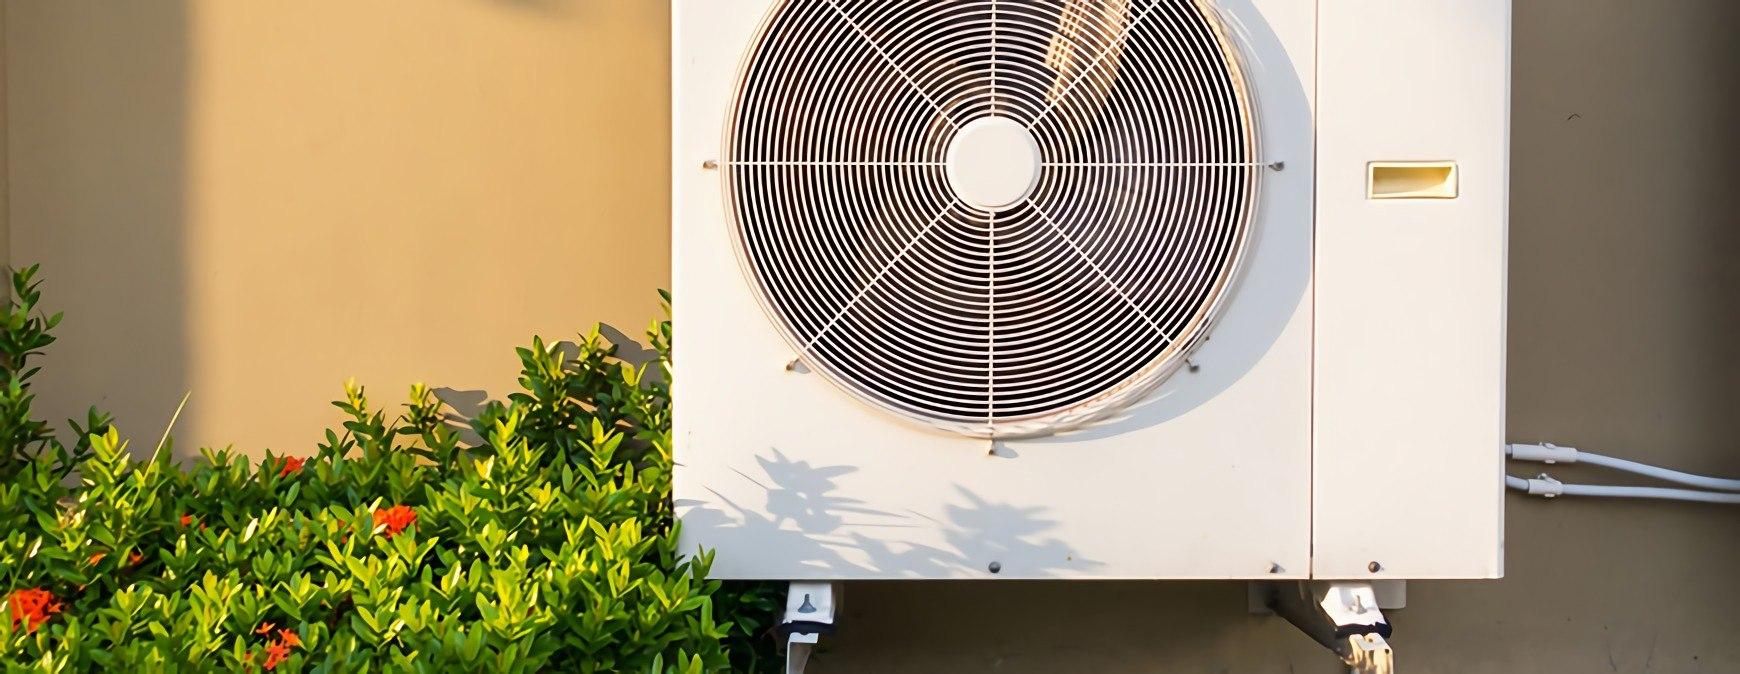 air conditioner with fan compressor